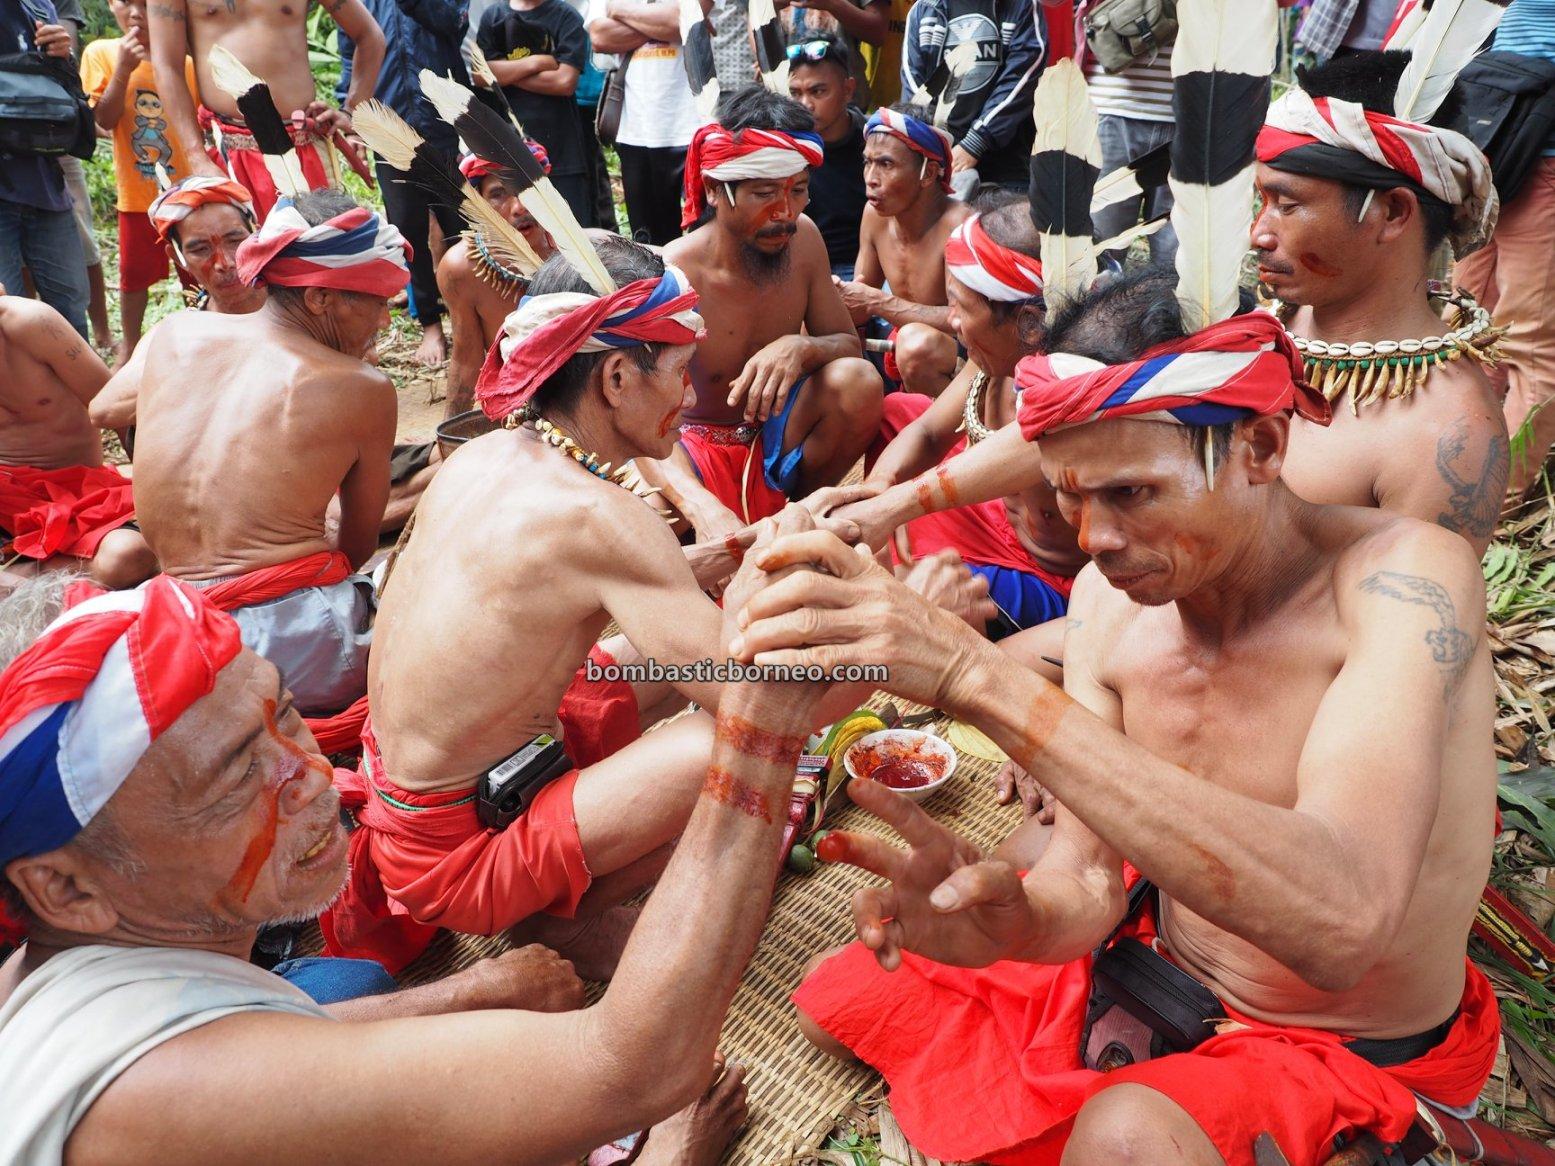 Gawai Dayak, Paddy Harvest Festival, authentic, traditional, budaya, Bengkayang, Desa Sahan, Native, Ethnic, indigenous, objek wisata, travel guide, Trans Borneo, 婆羅洲达雅传统文化, 印尼西加里曼丹, 孟加映比达友丰收节